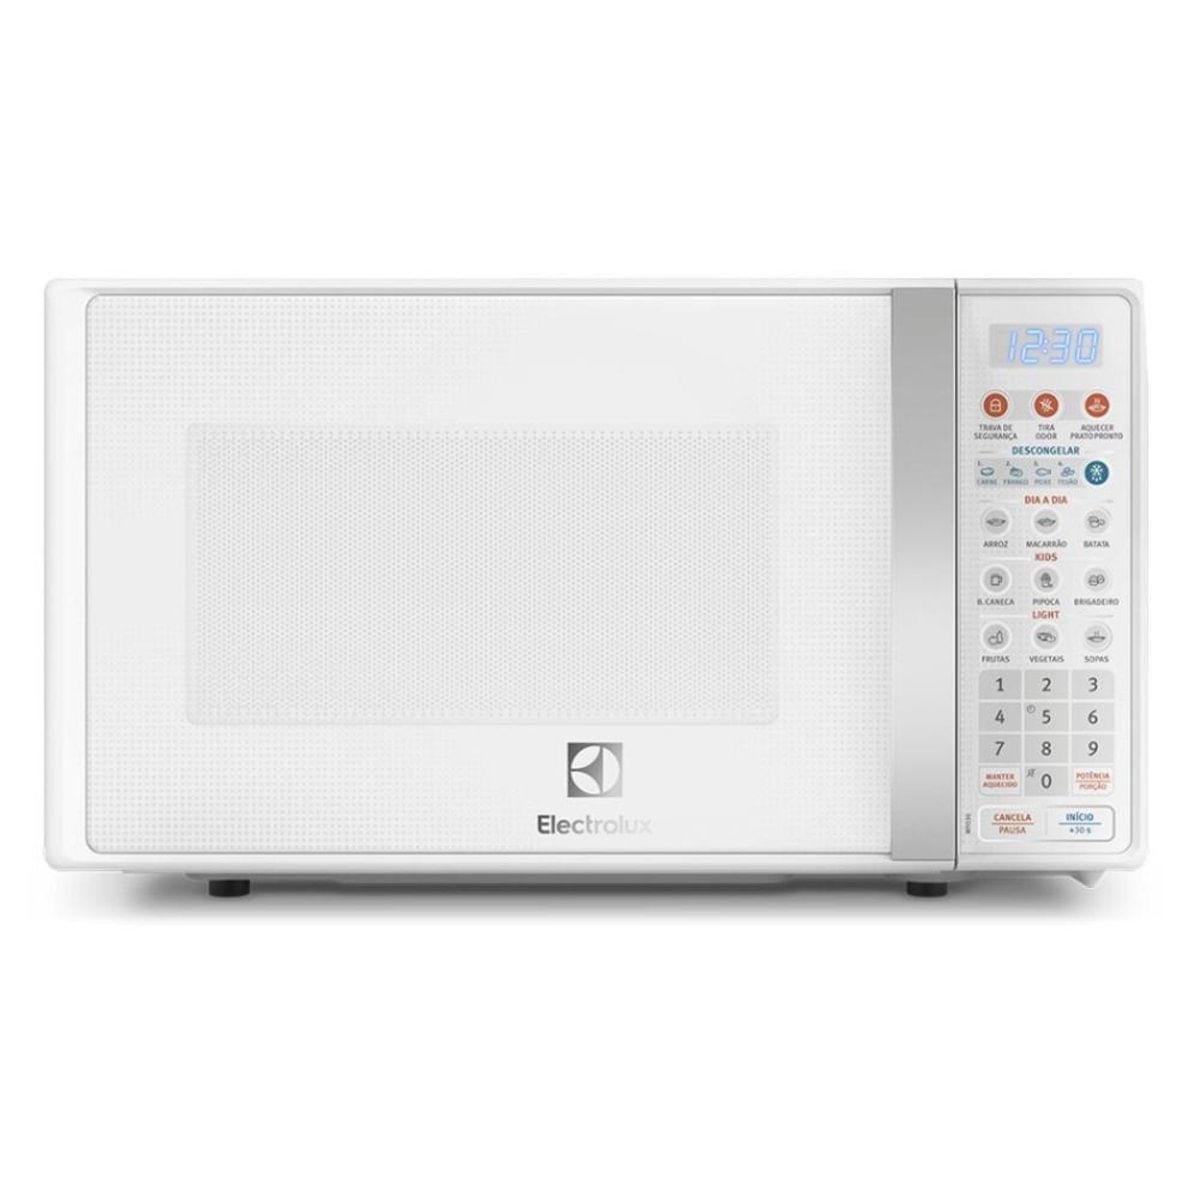 Imagem de Micro-ondas Electrolux 20 Litros Branco - MTO30